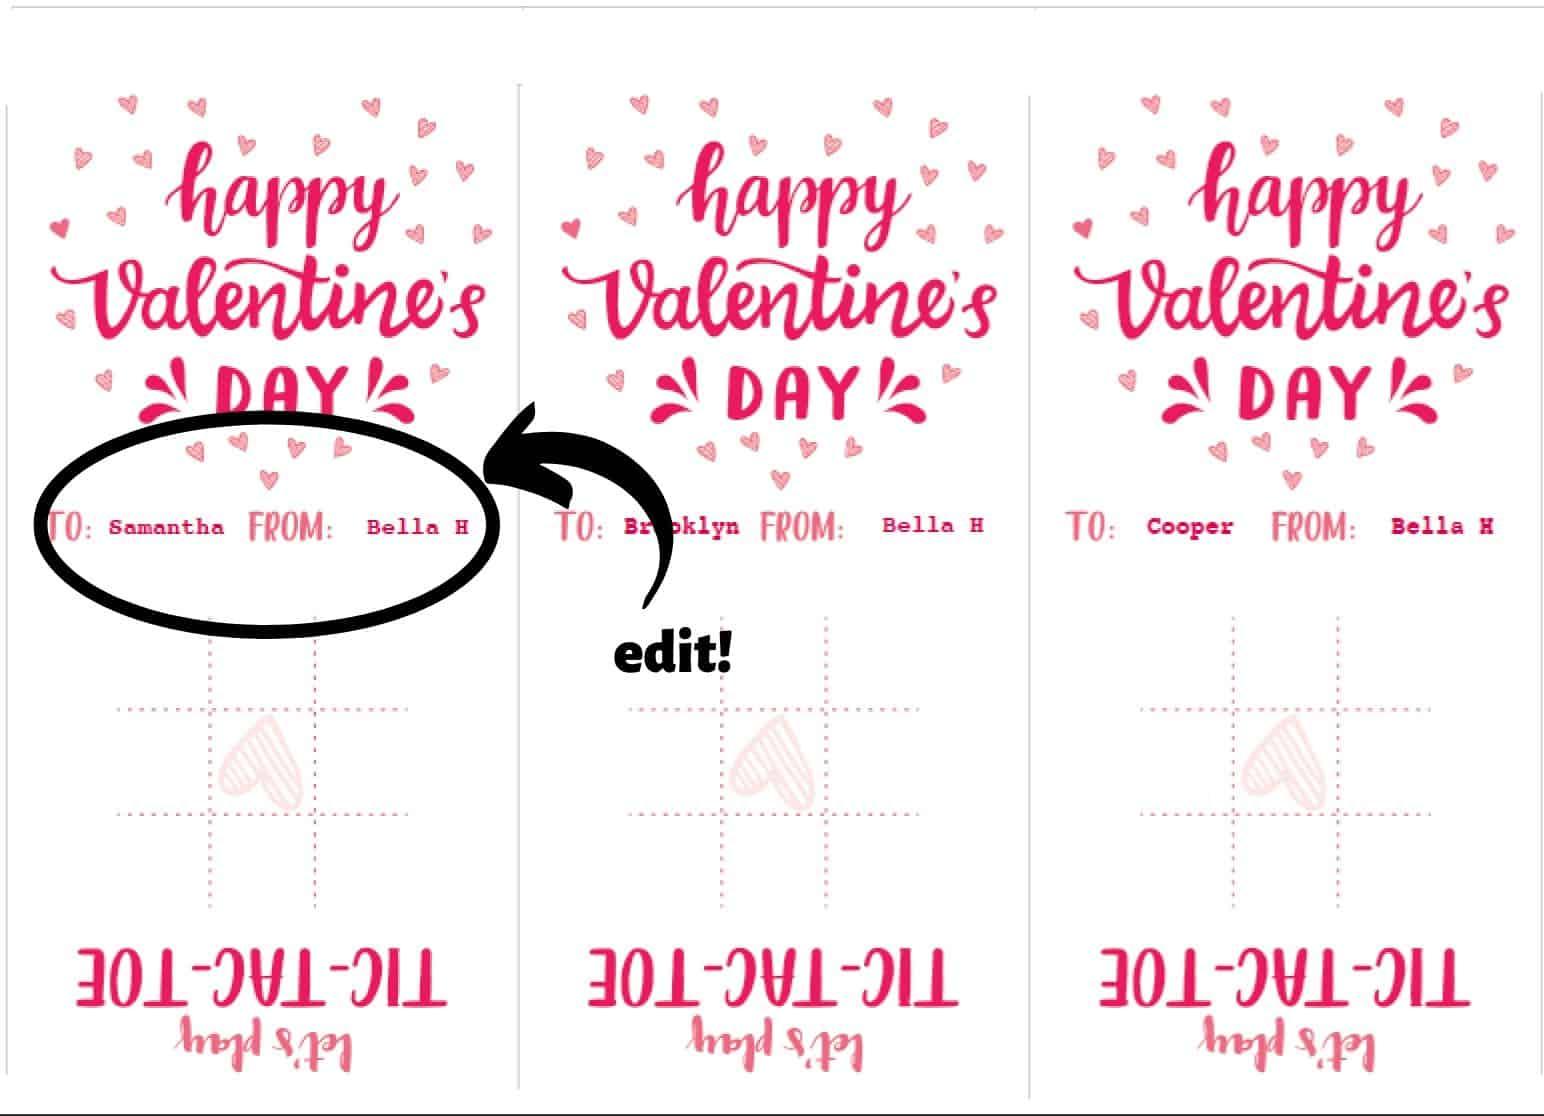 personalized tic tac toe Valentine